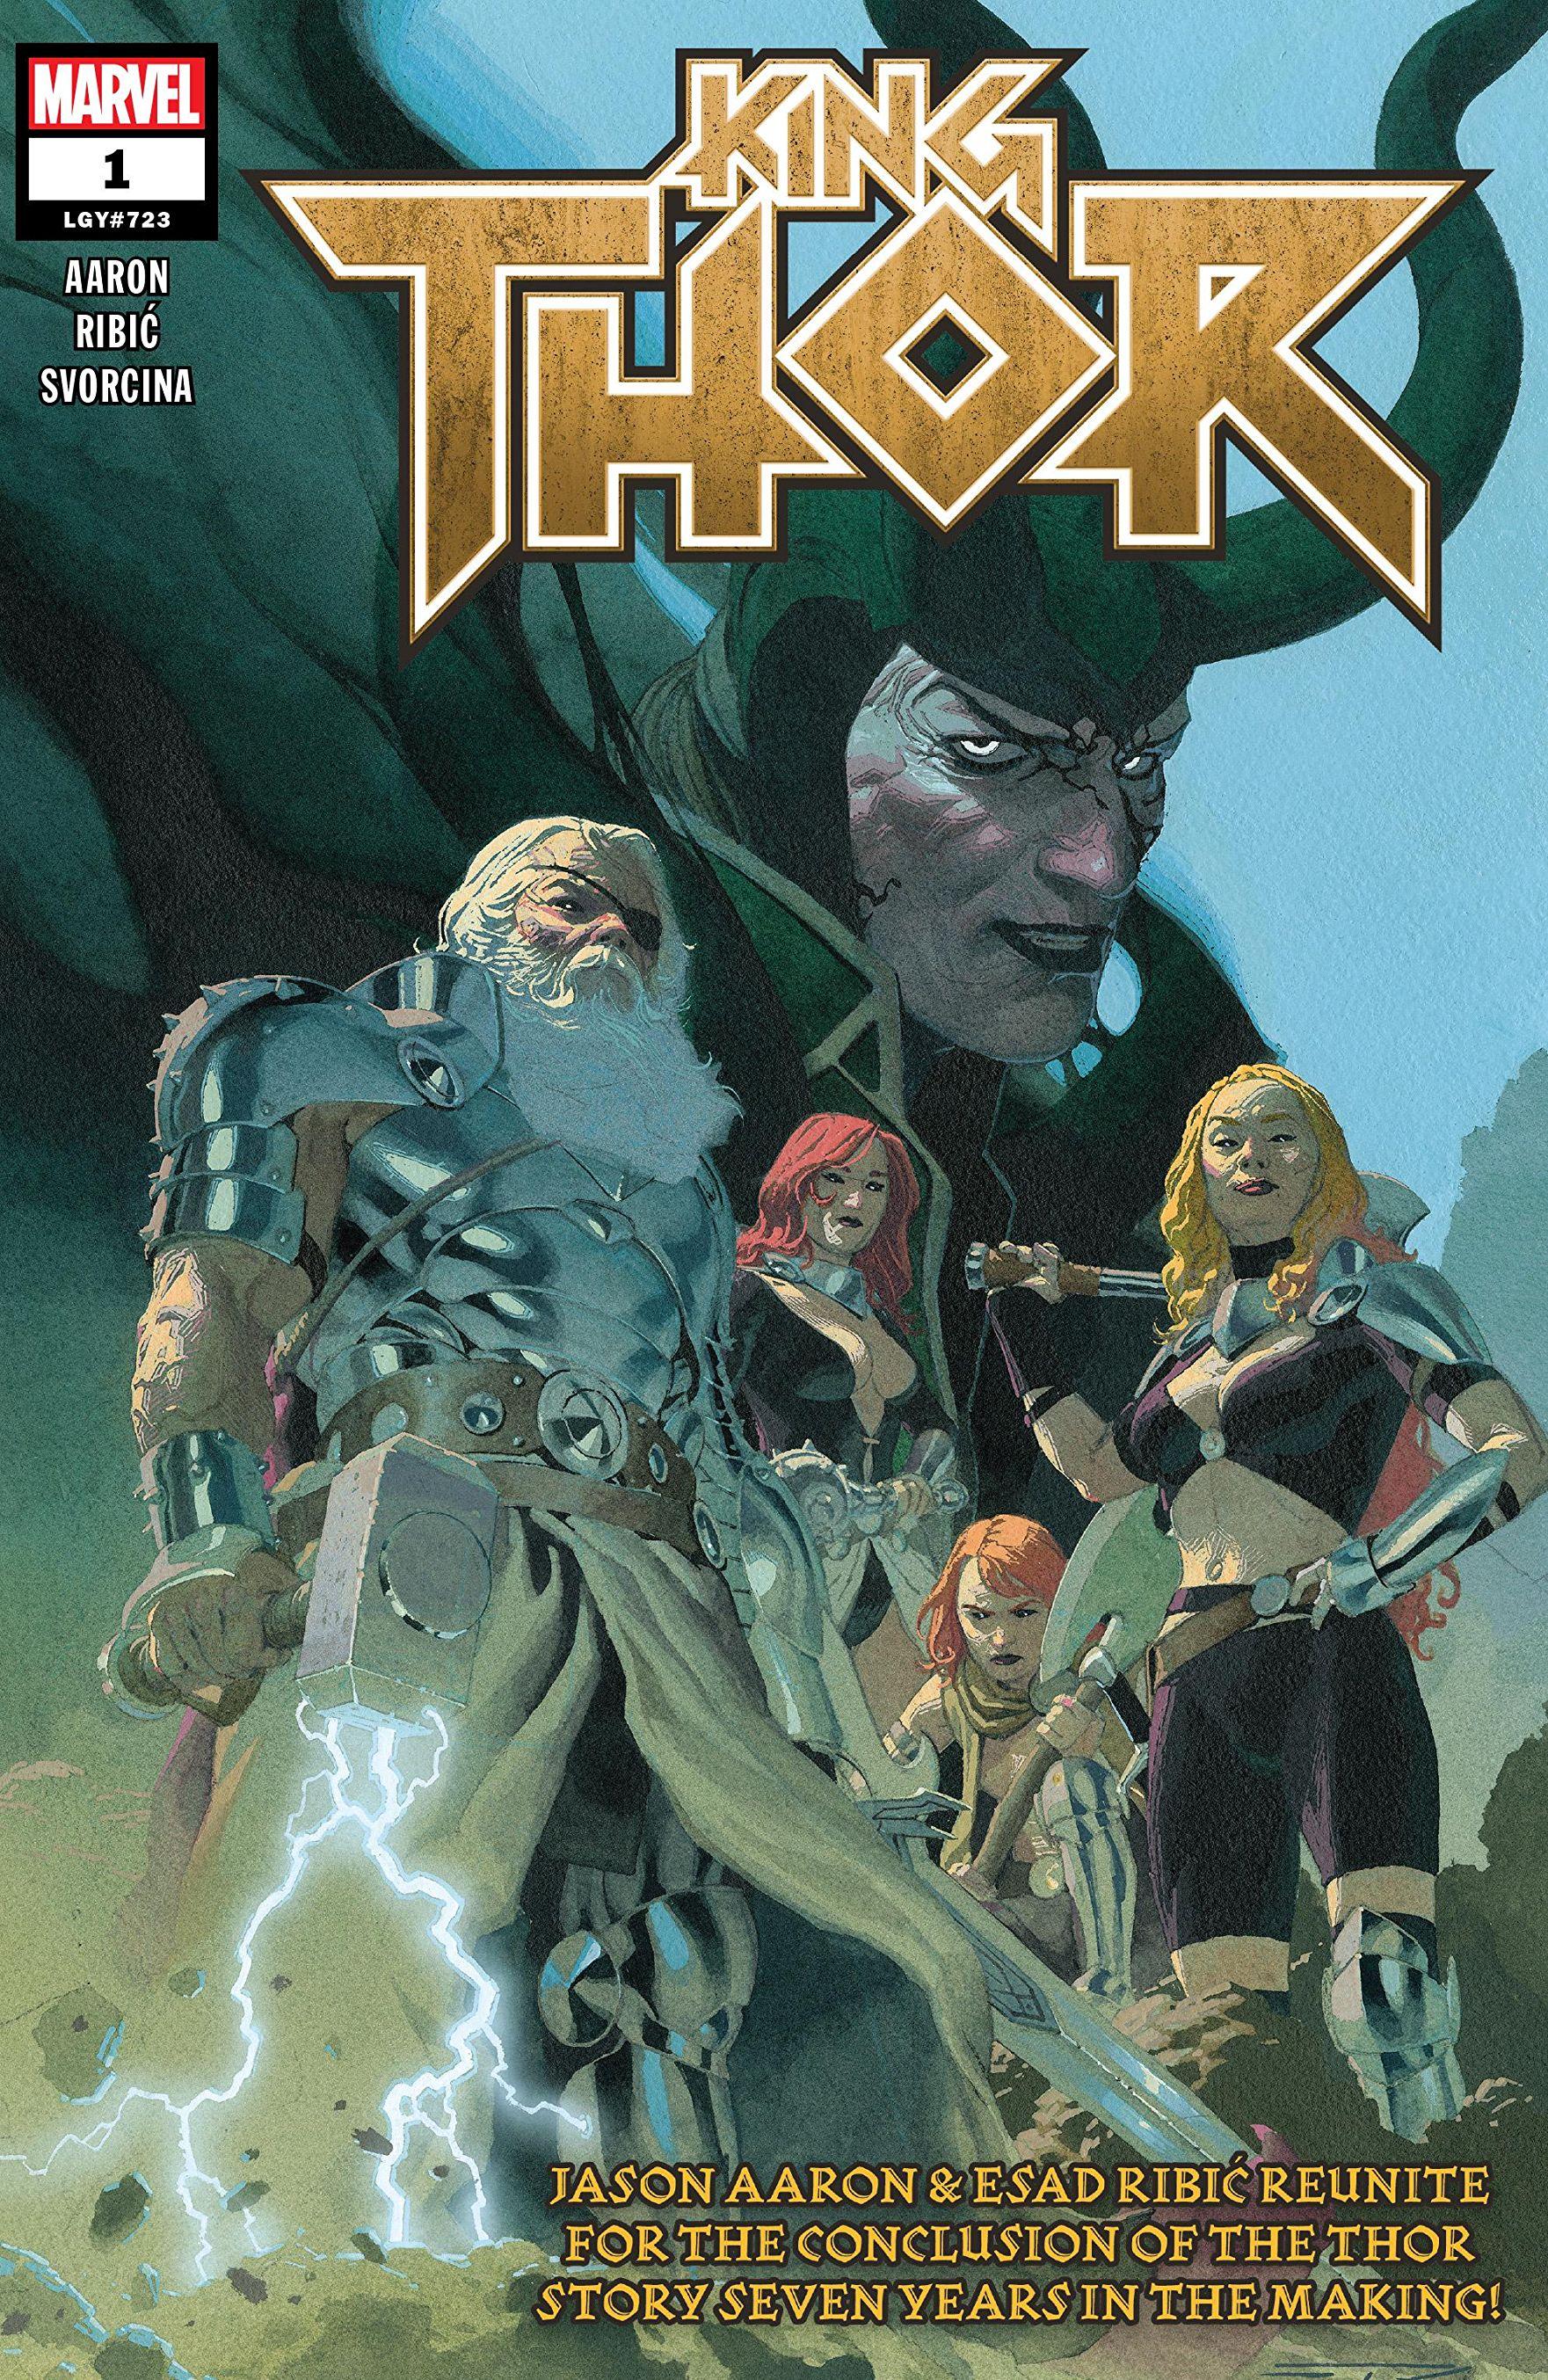 Portada de King Thor Volumen 1 #01